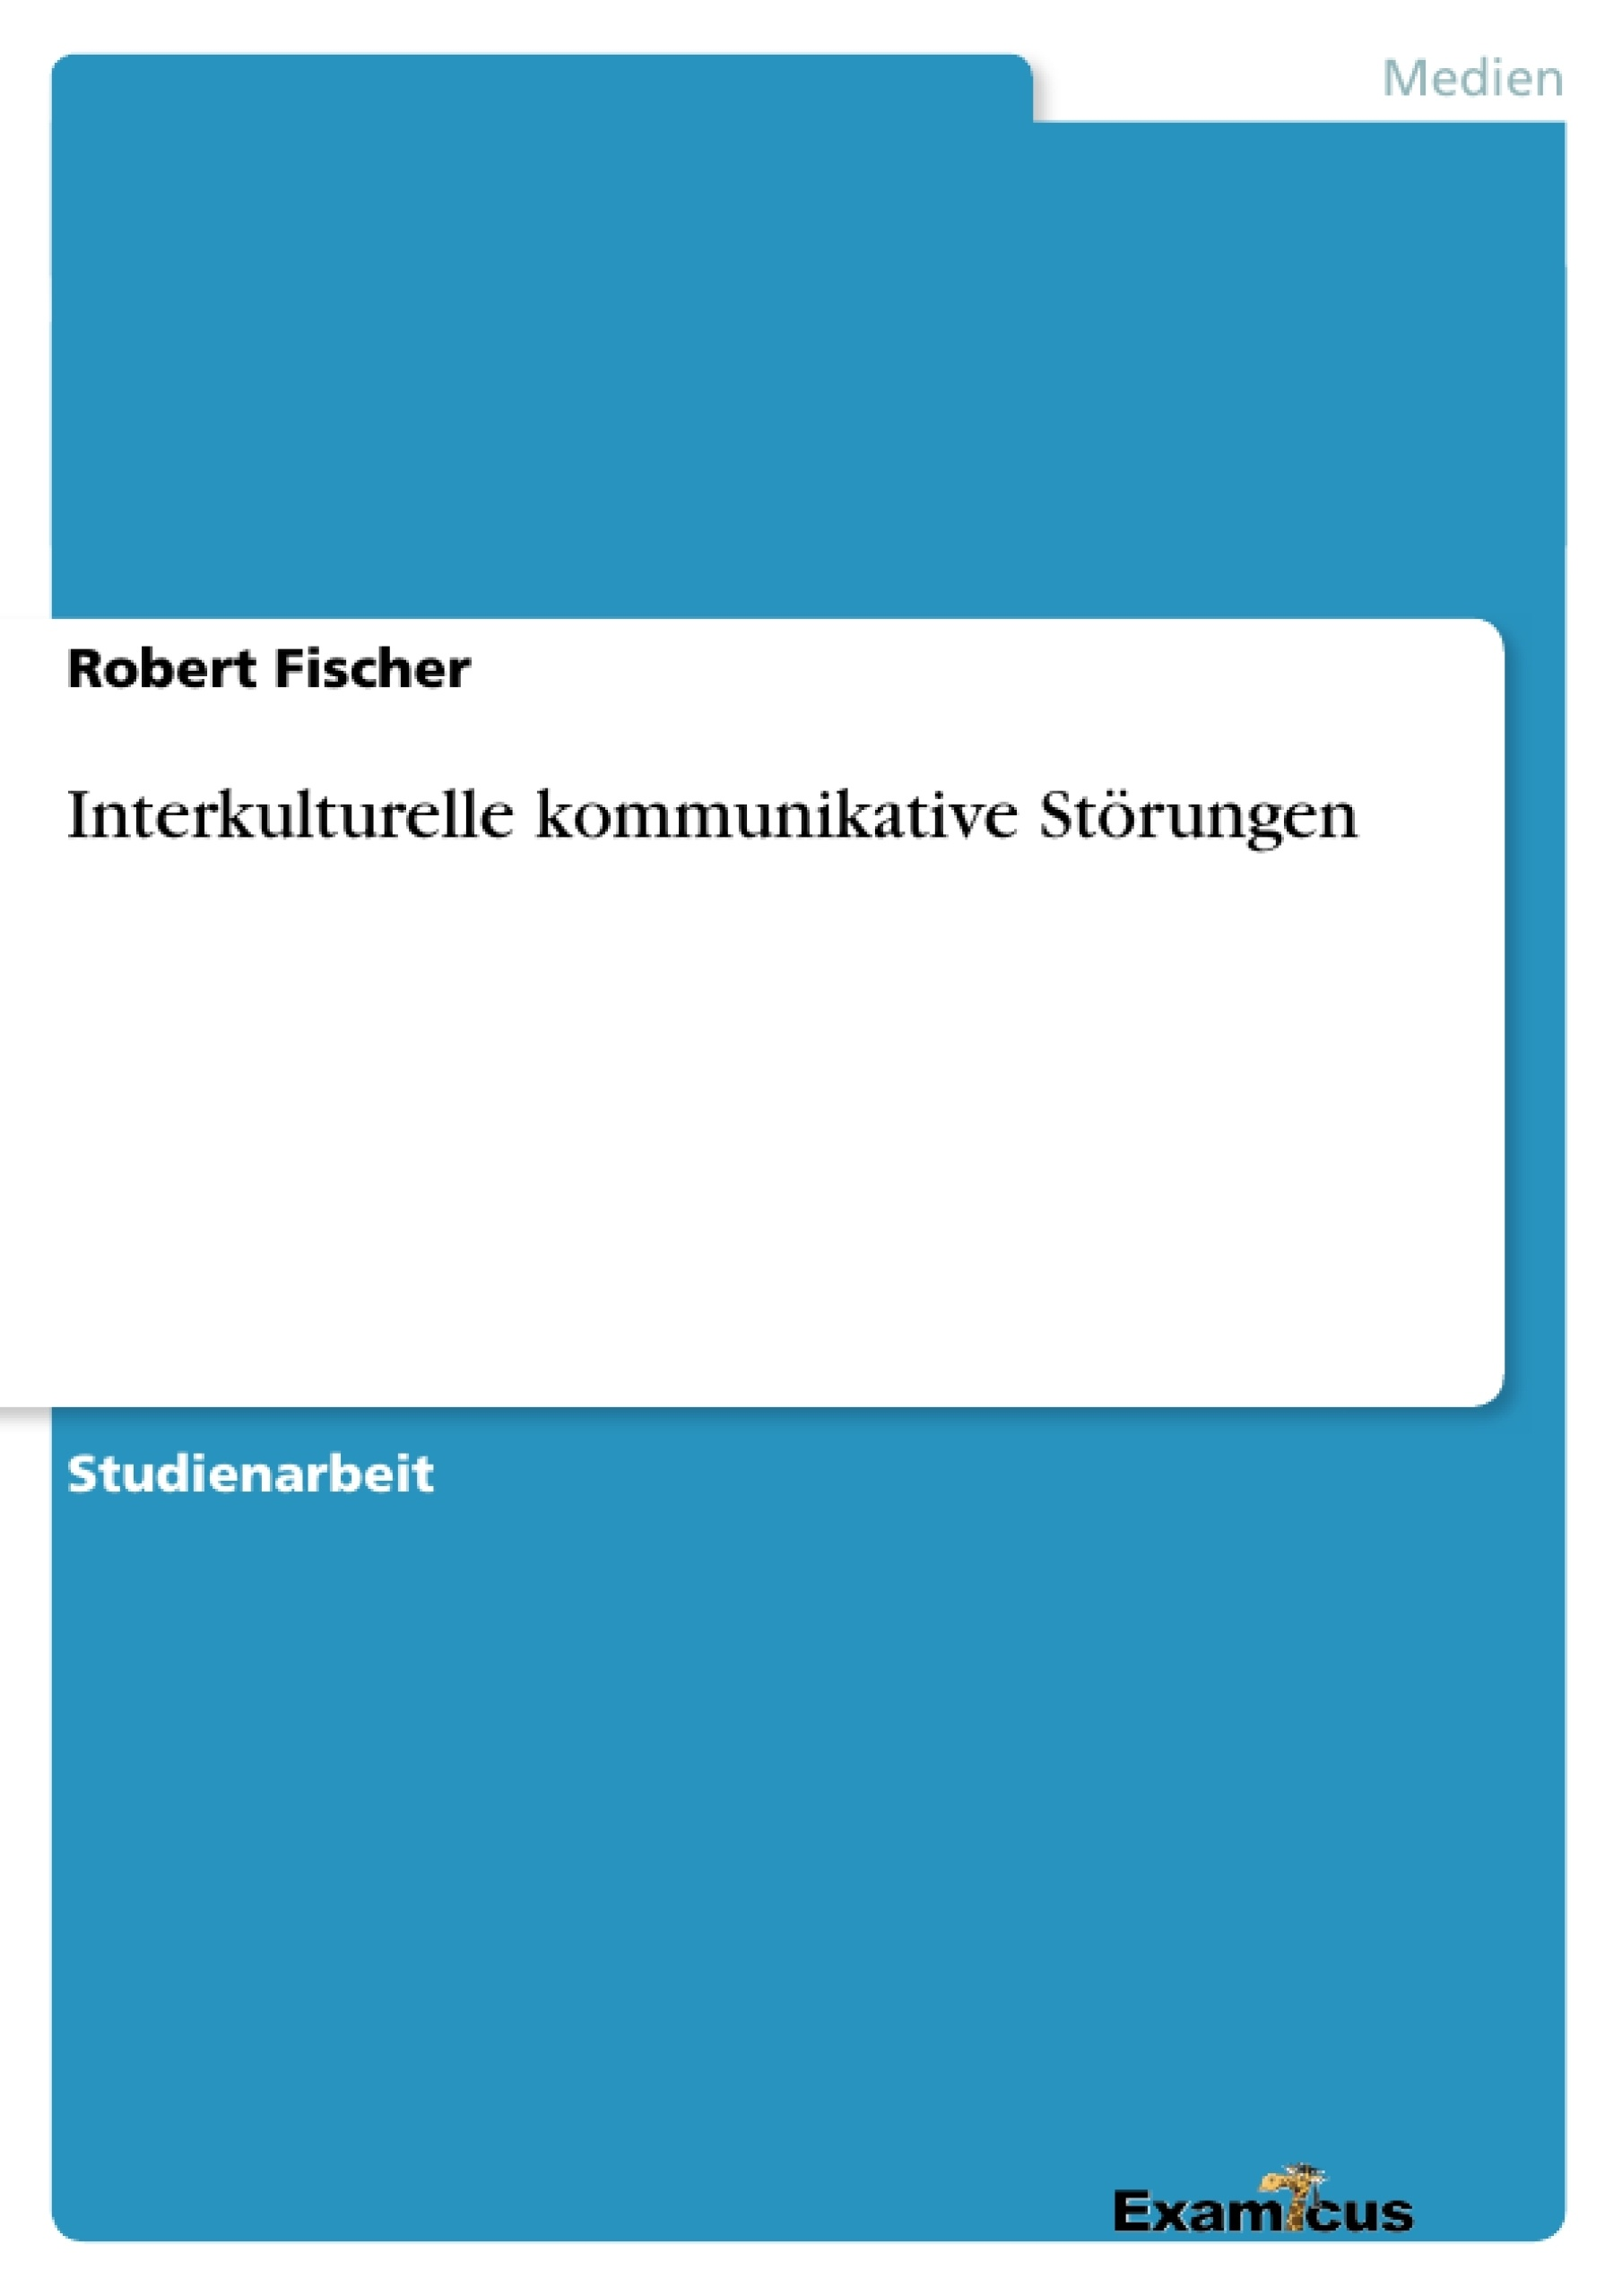 Titel: Interkulturelle kommunikative Störungen